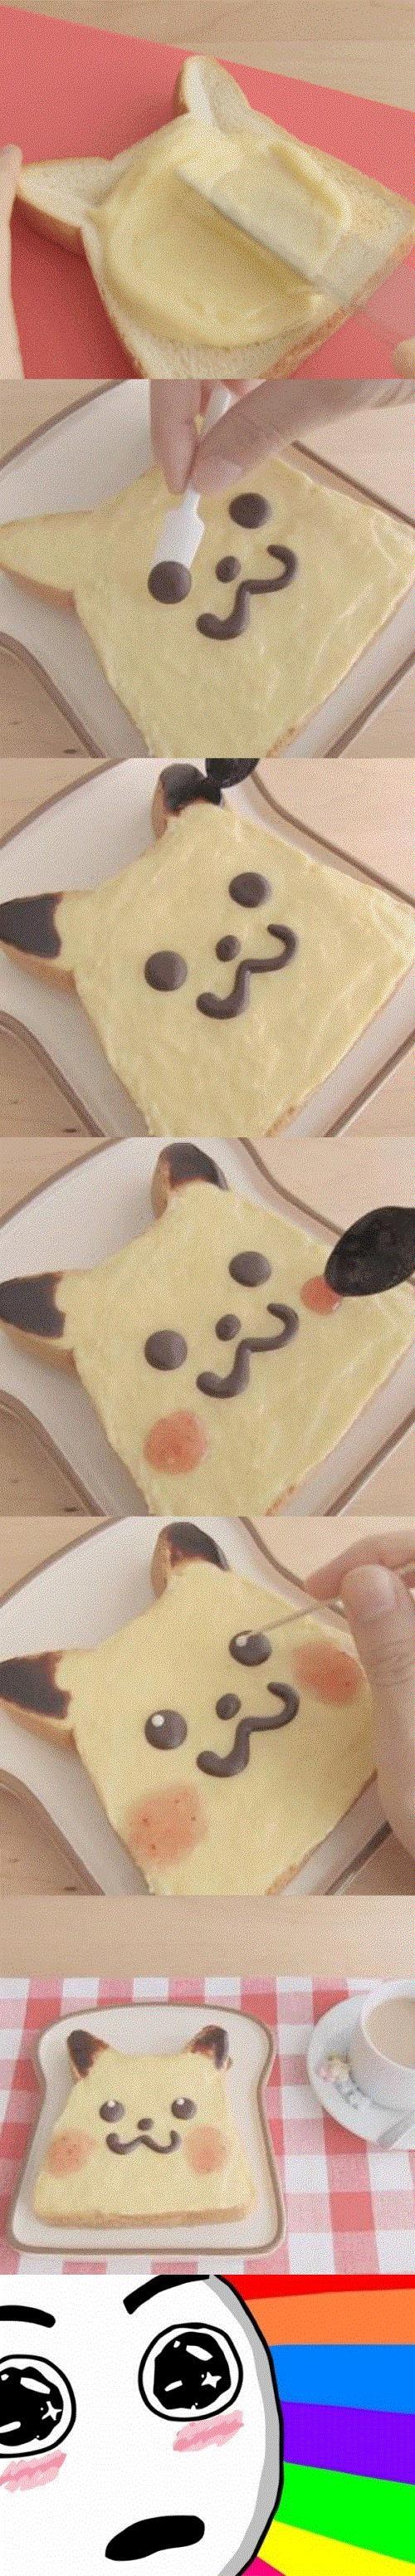 Amazed - Tostada de Pikachu